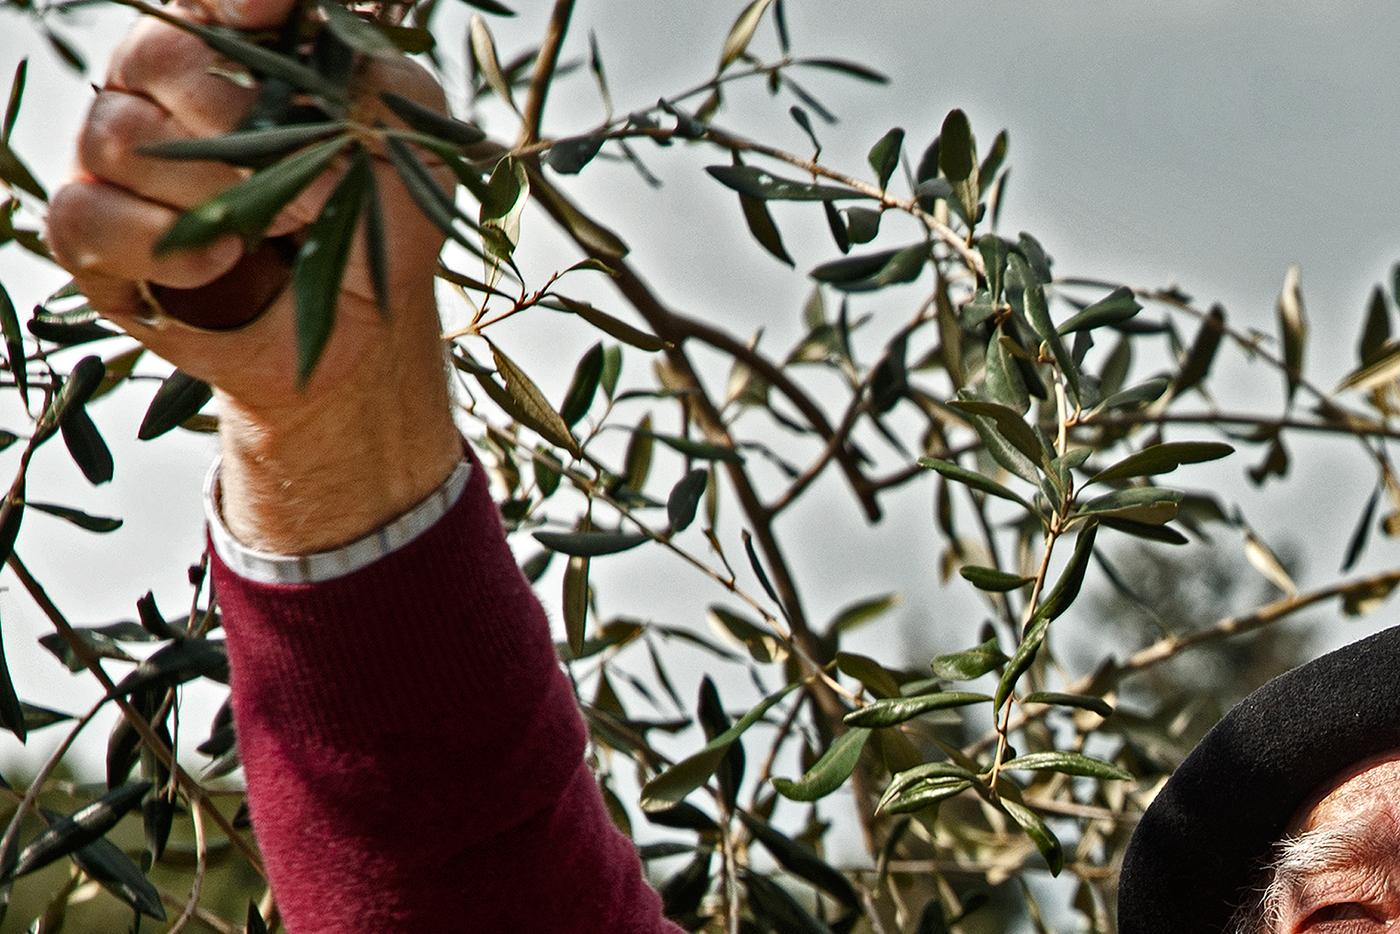 Andriotis Greece extra virgin corfu Olive Oil evoo christrivizas trivizas